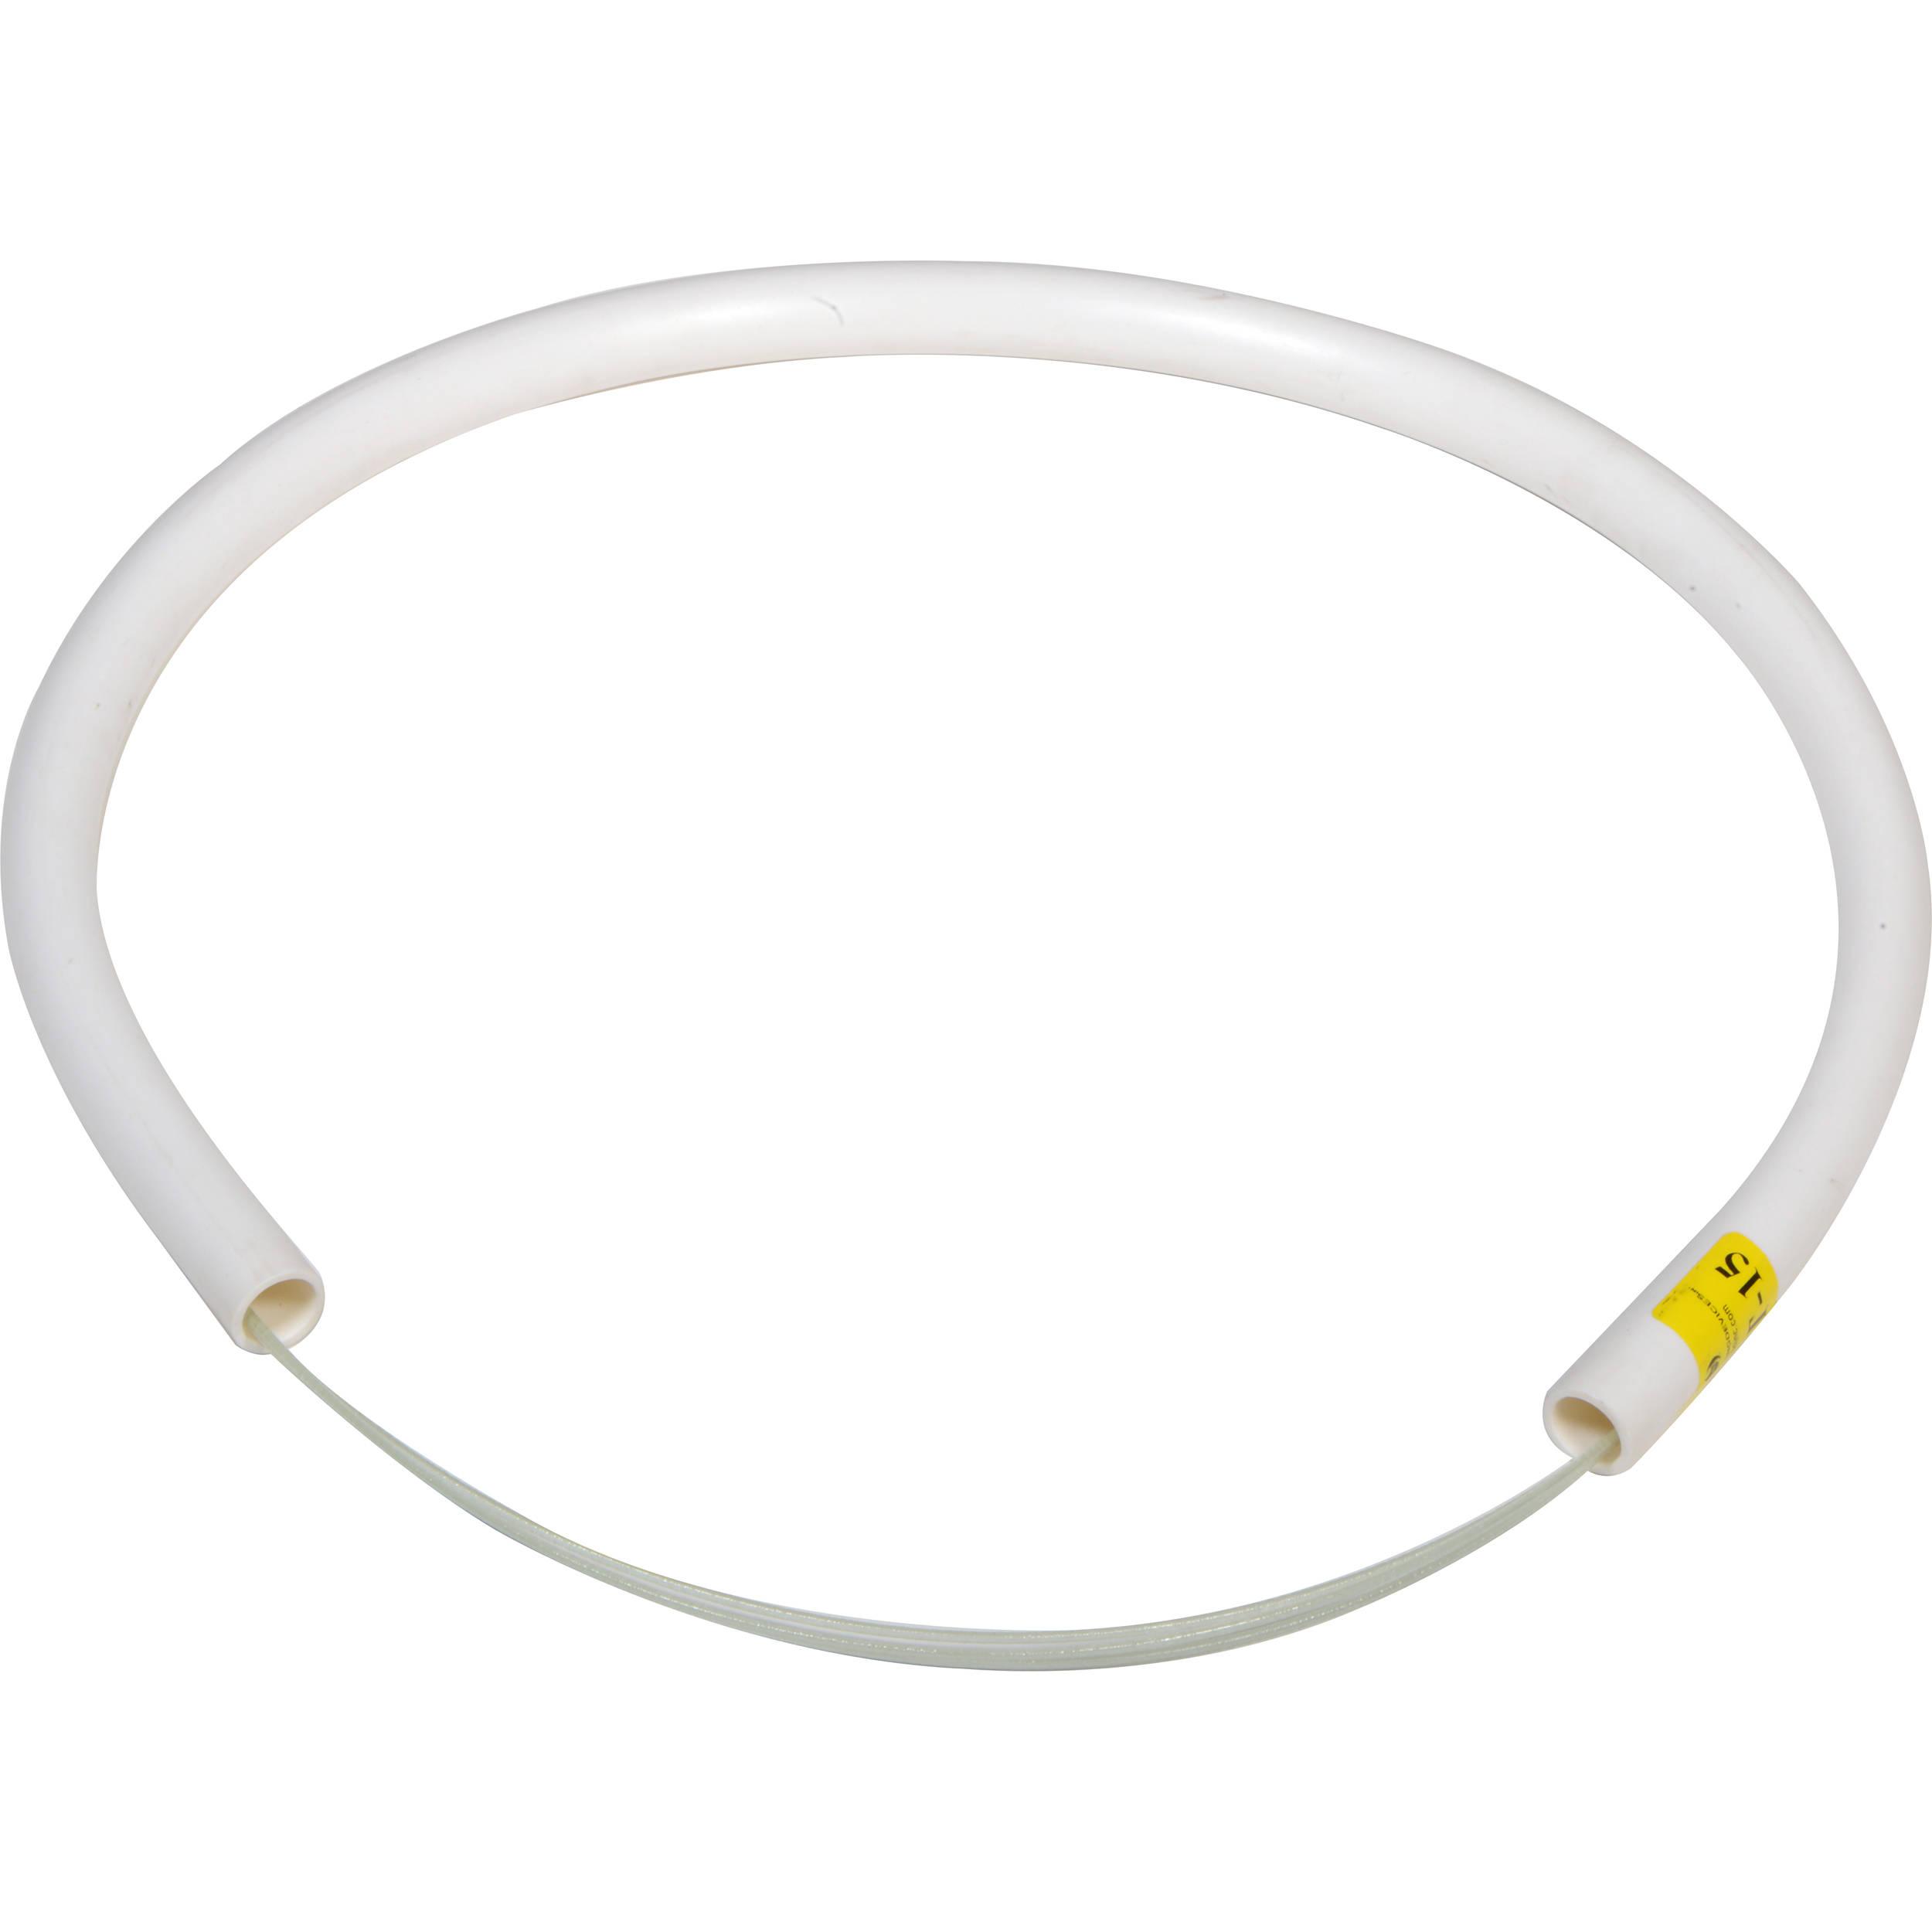 Labor saving devices yft epoxy fiberglass fish tape 15 for Fiberglass fish tape